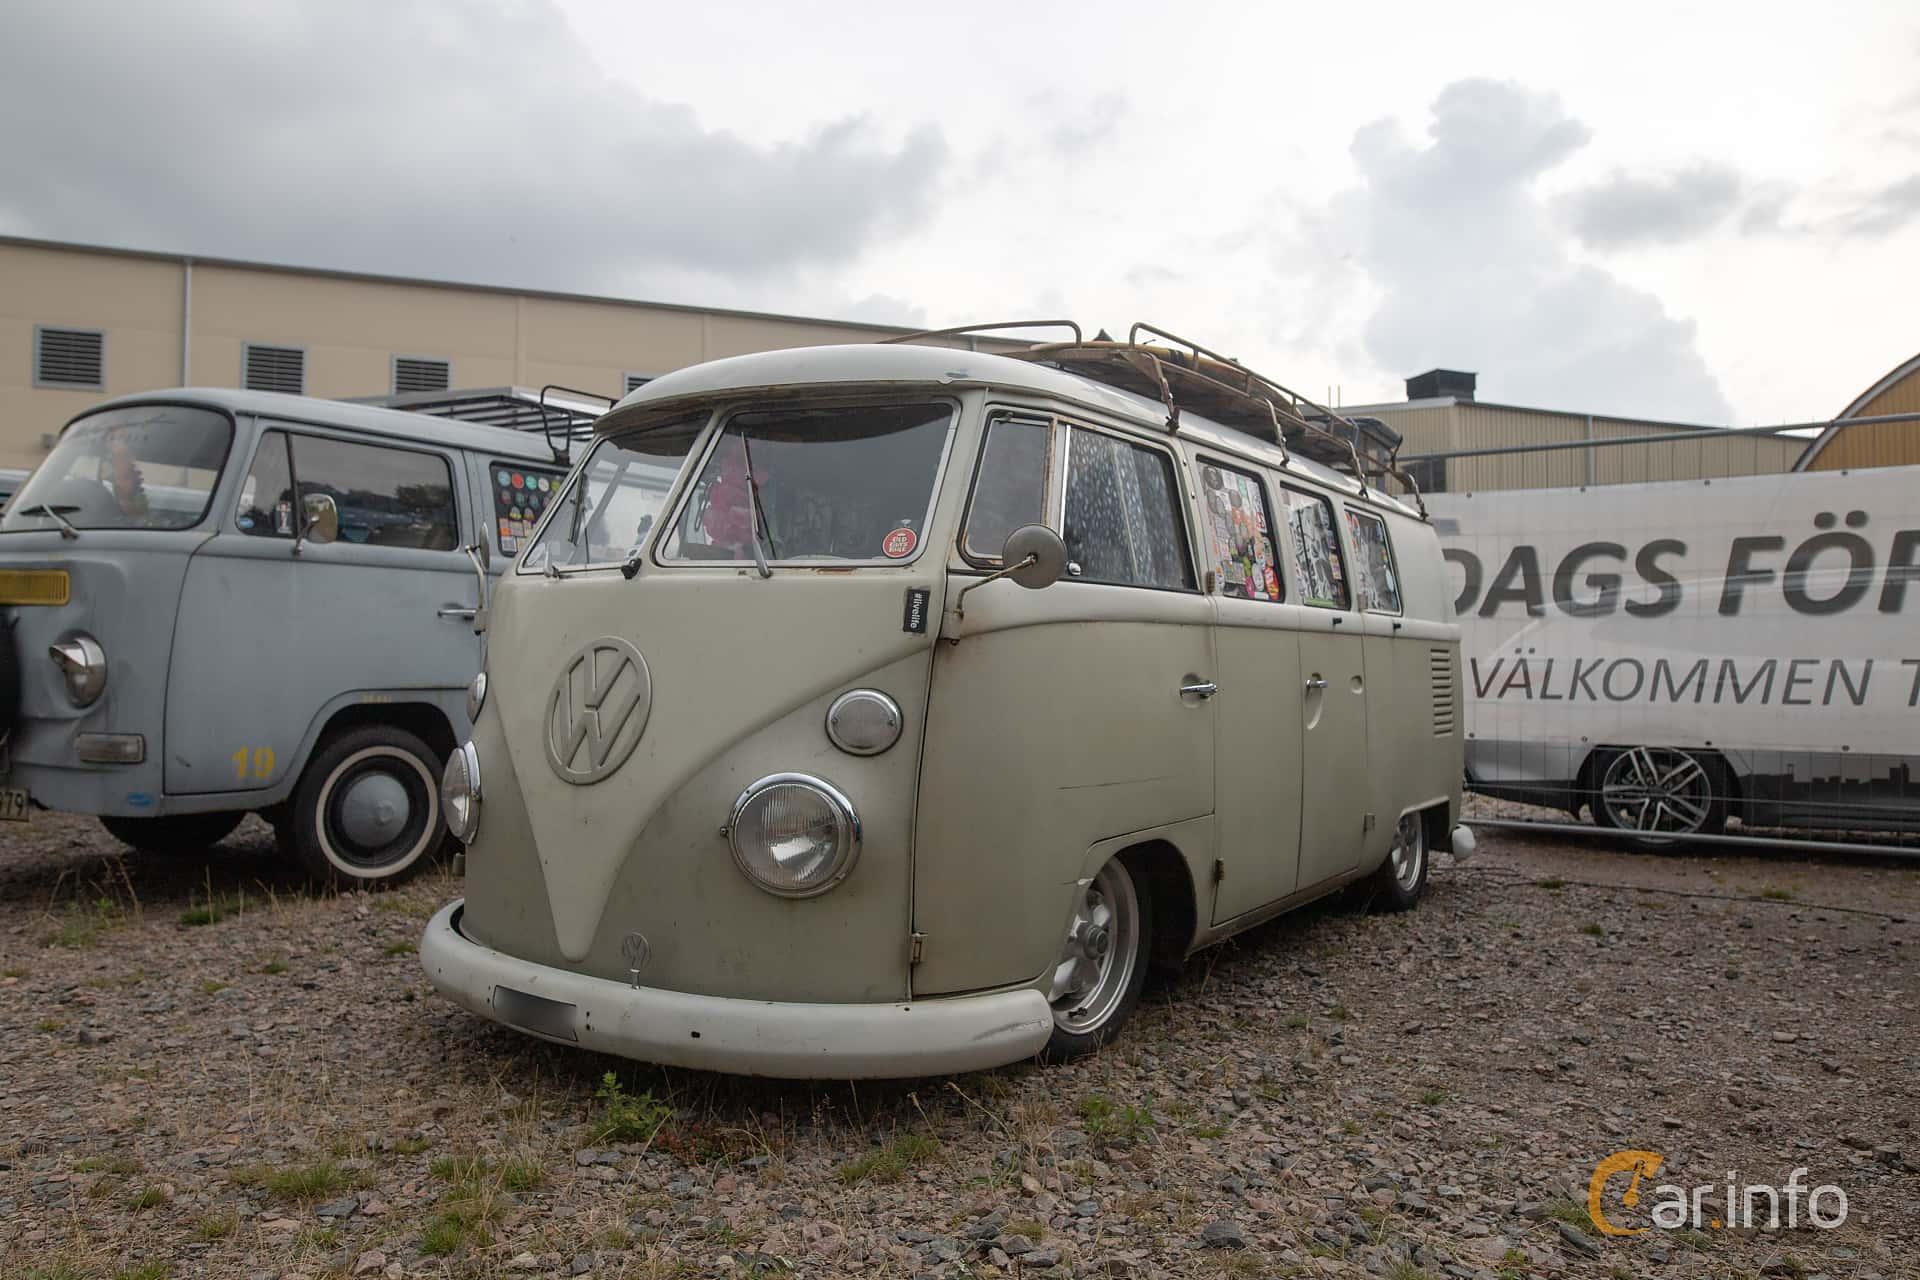 Front/Side  of Volkswagen Transporter 1500 1.5 Manual, 44ps, 1967 at West Coast Bug Meet 2019